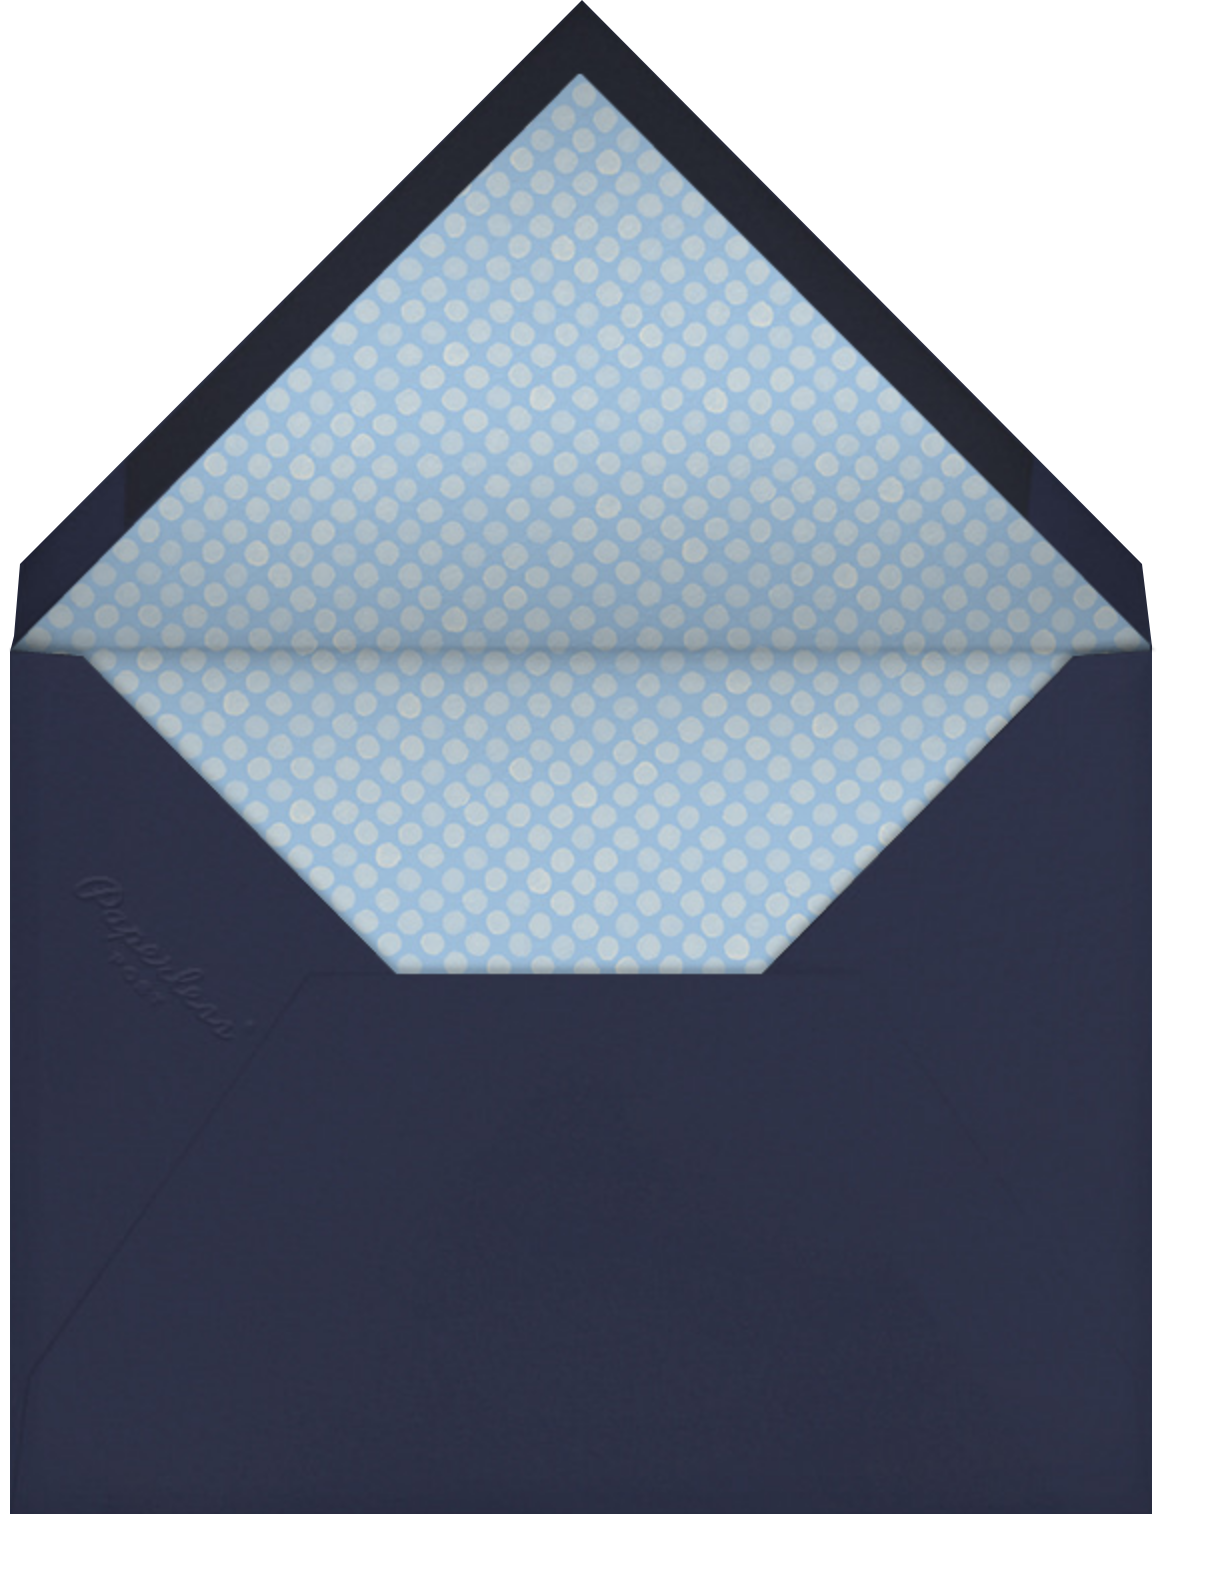 Tea Time - Paperless Post - Envelope